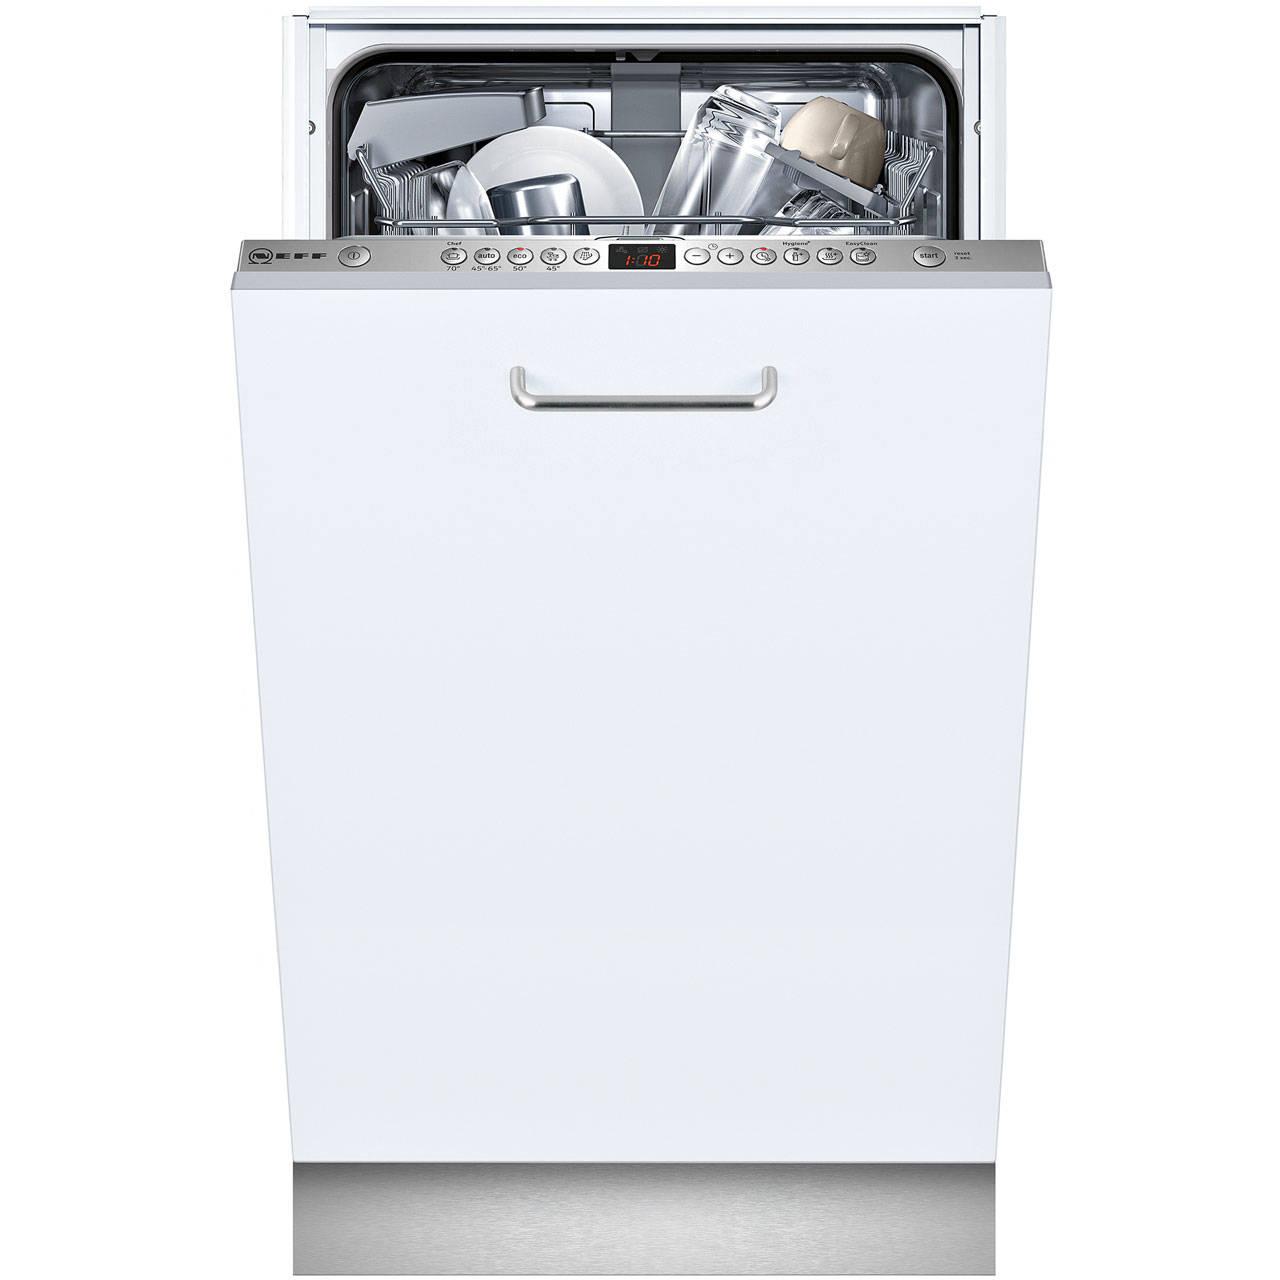 Neff S583C50XOG slimline integrated dishwasher